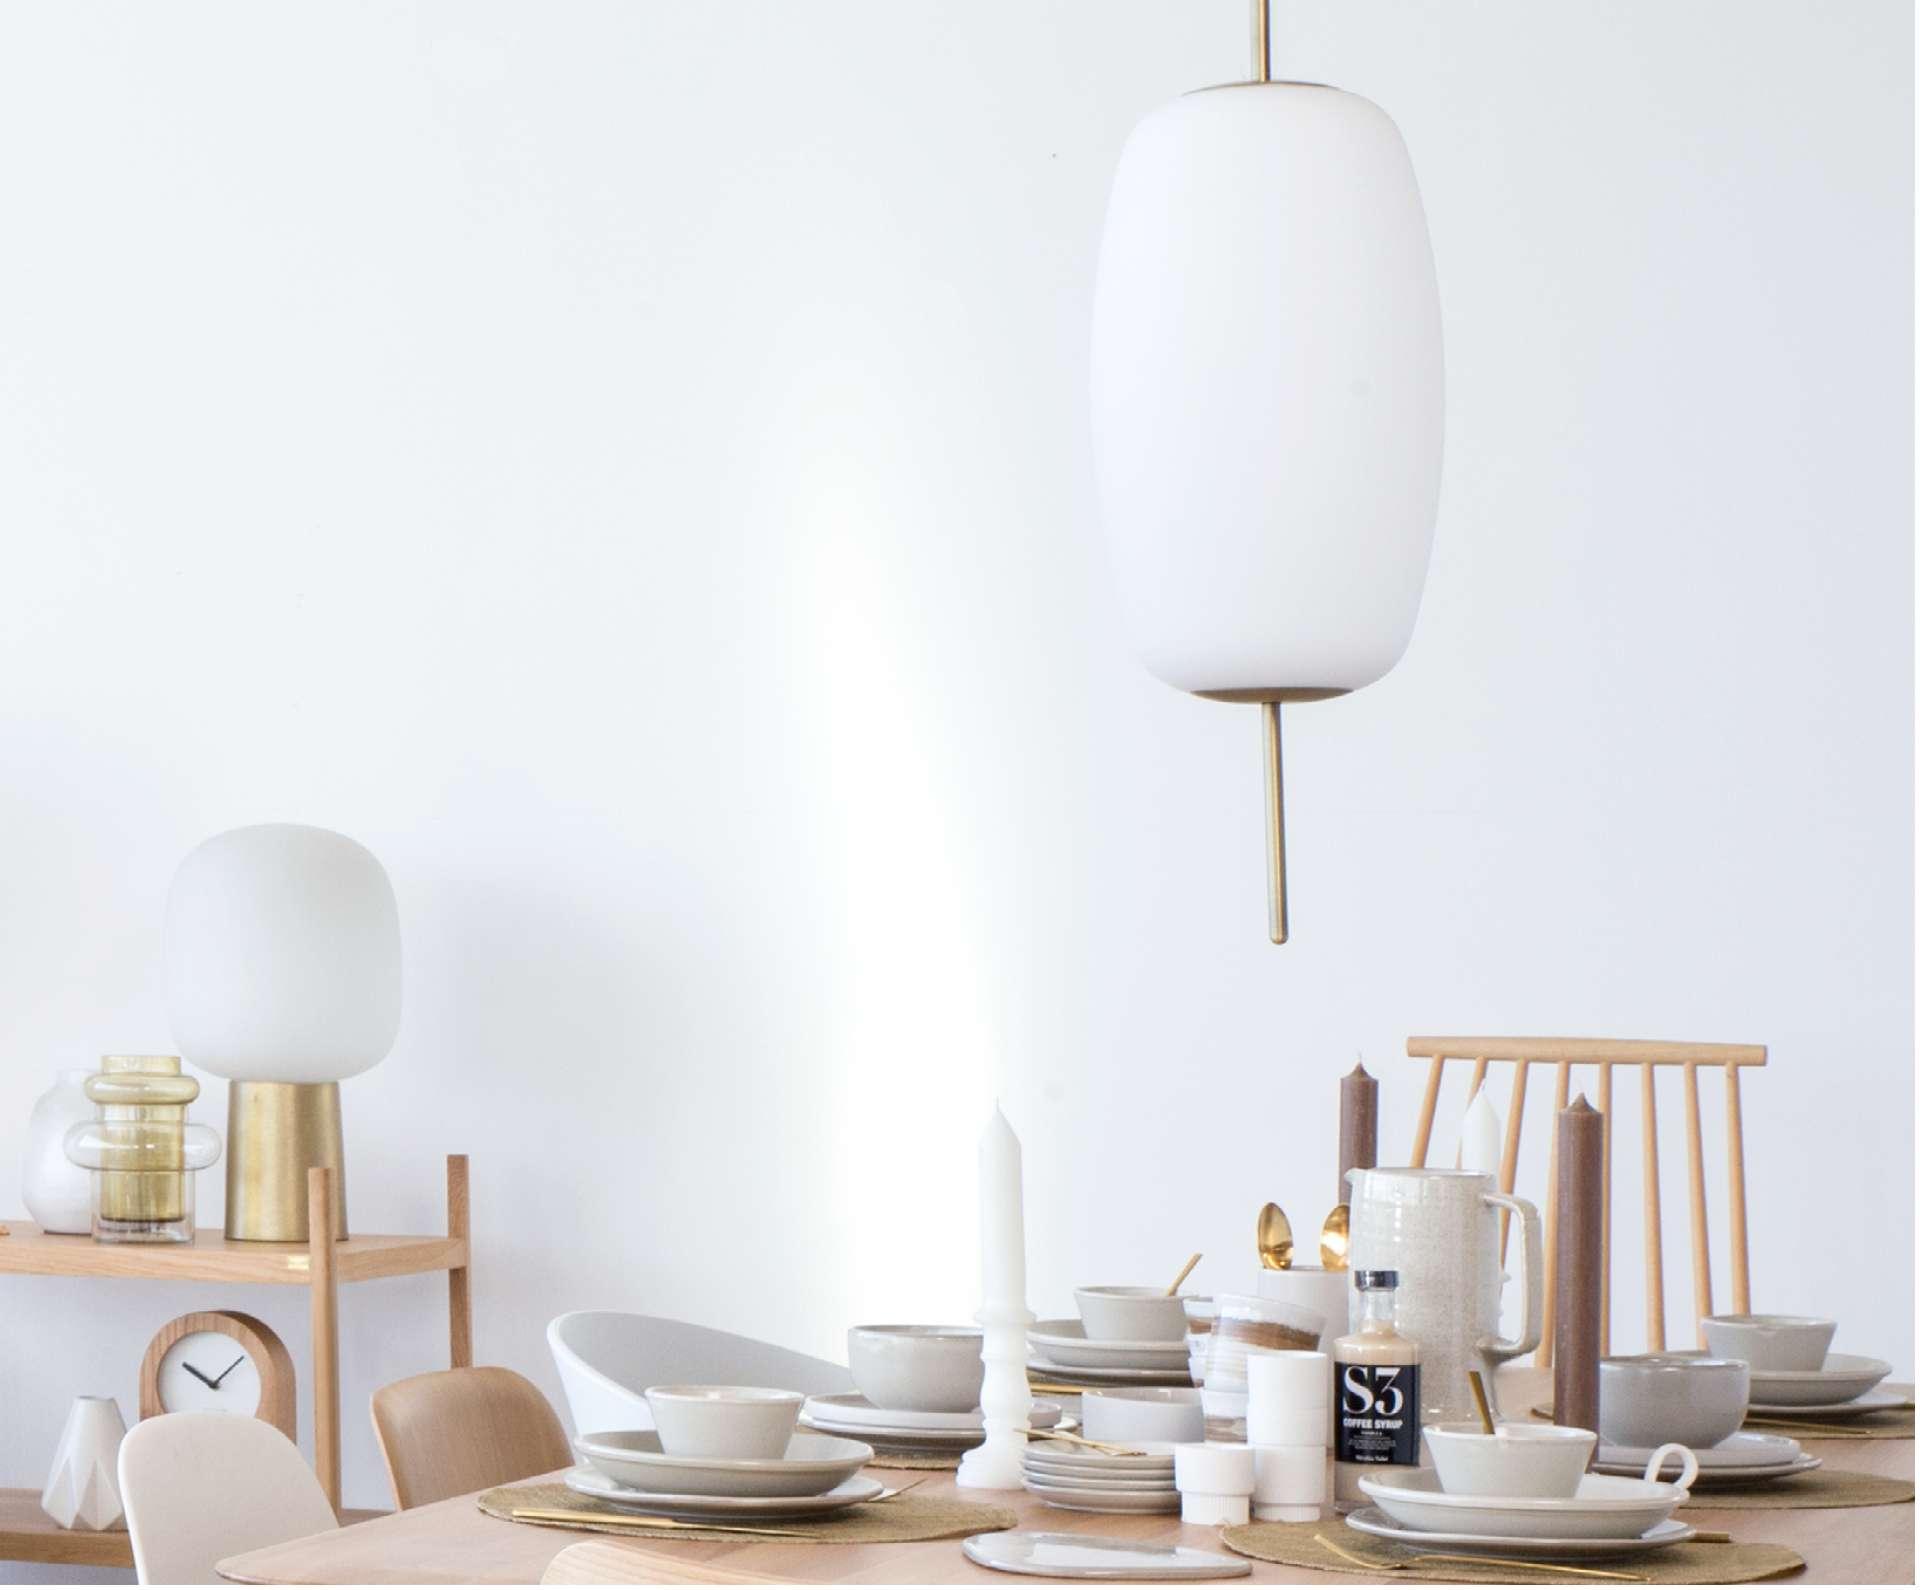 Industriele Hanglamp Keuken : Hanglampen loods 5